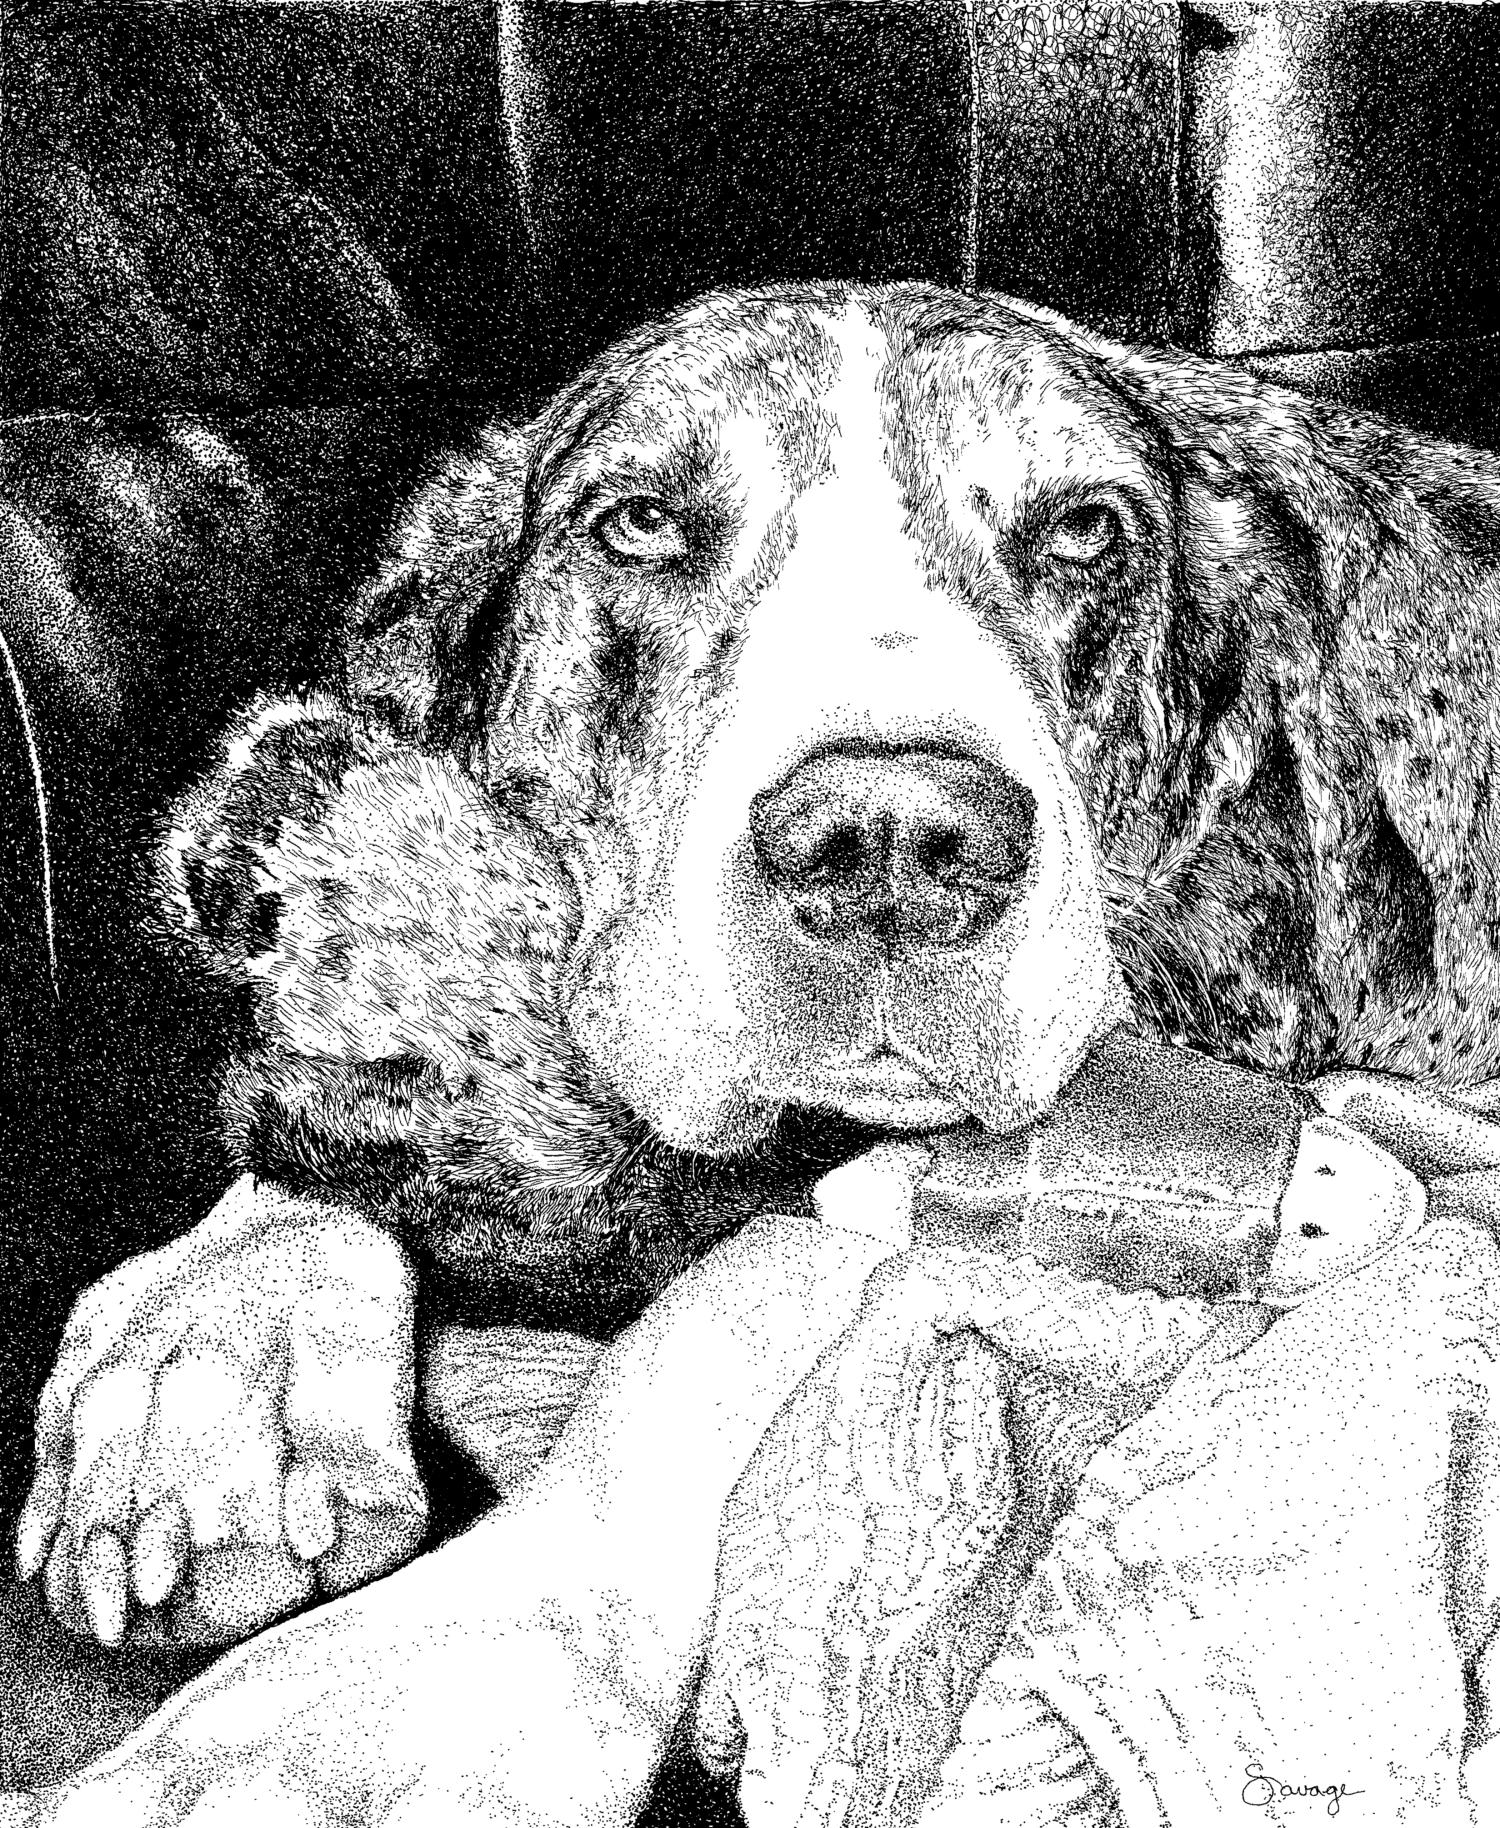 Peppermint Patty, Great Dane